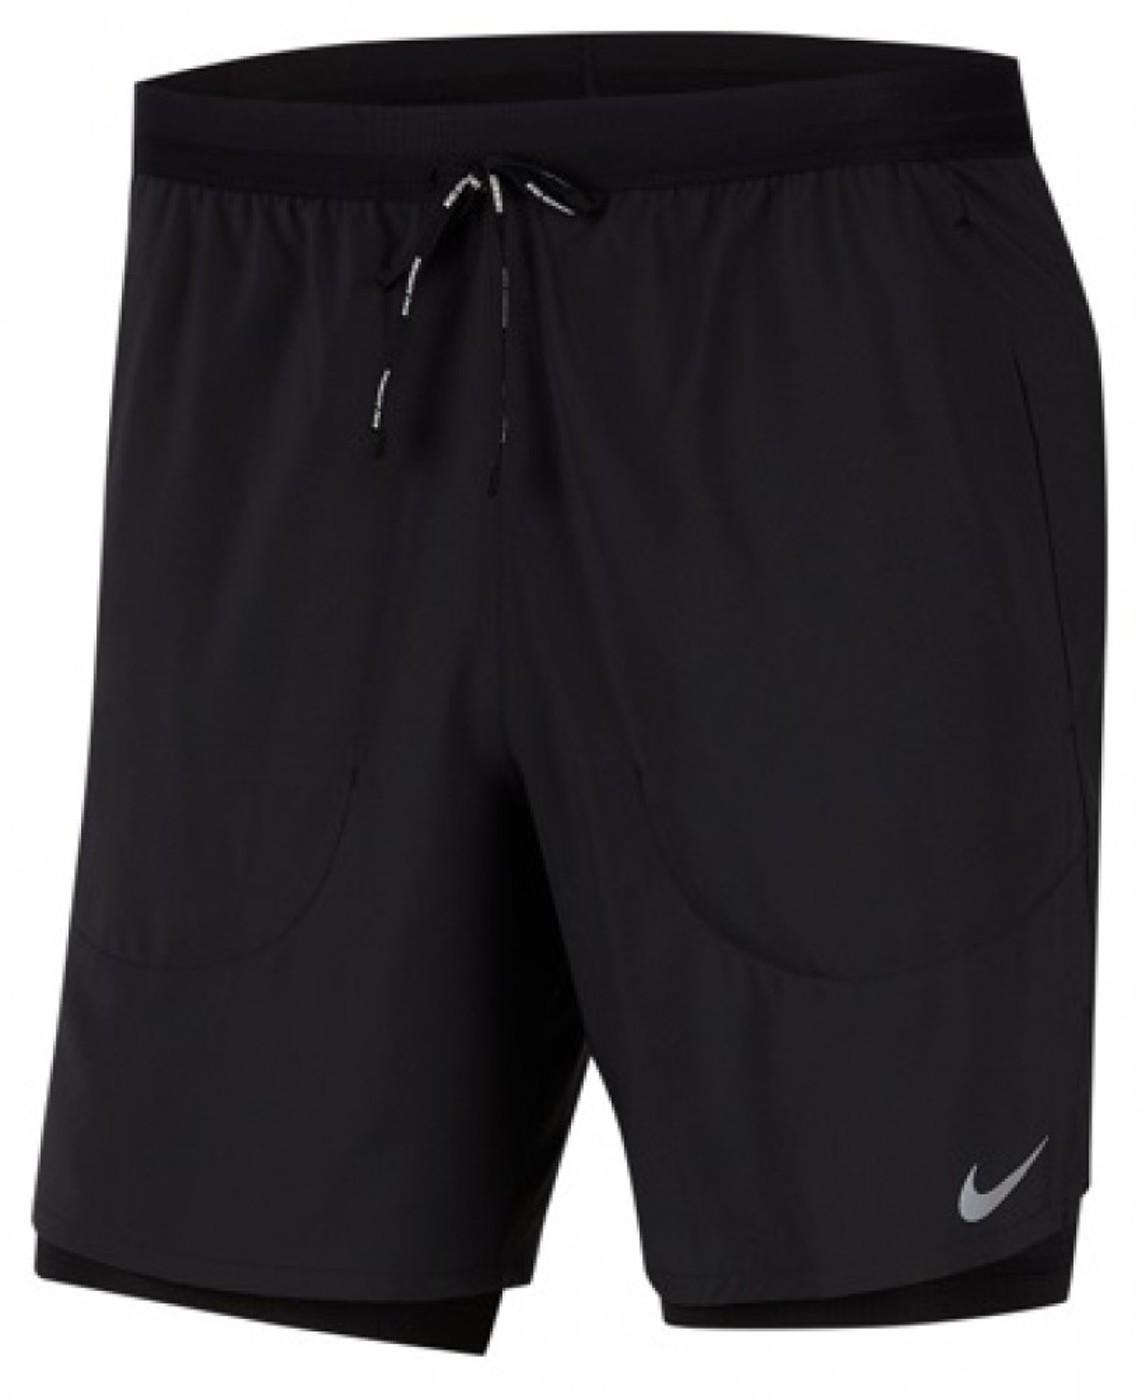 "Nike Flex Stride 7"" 2-In - Herren"